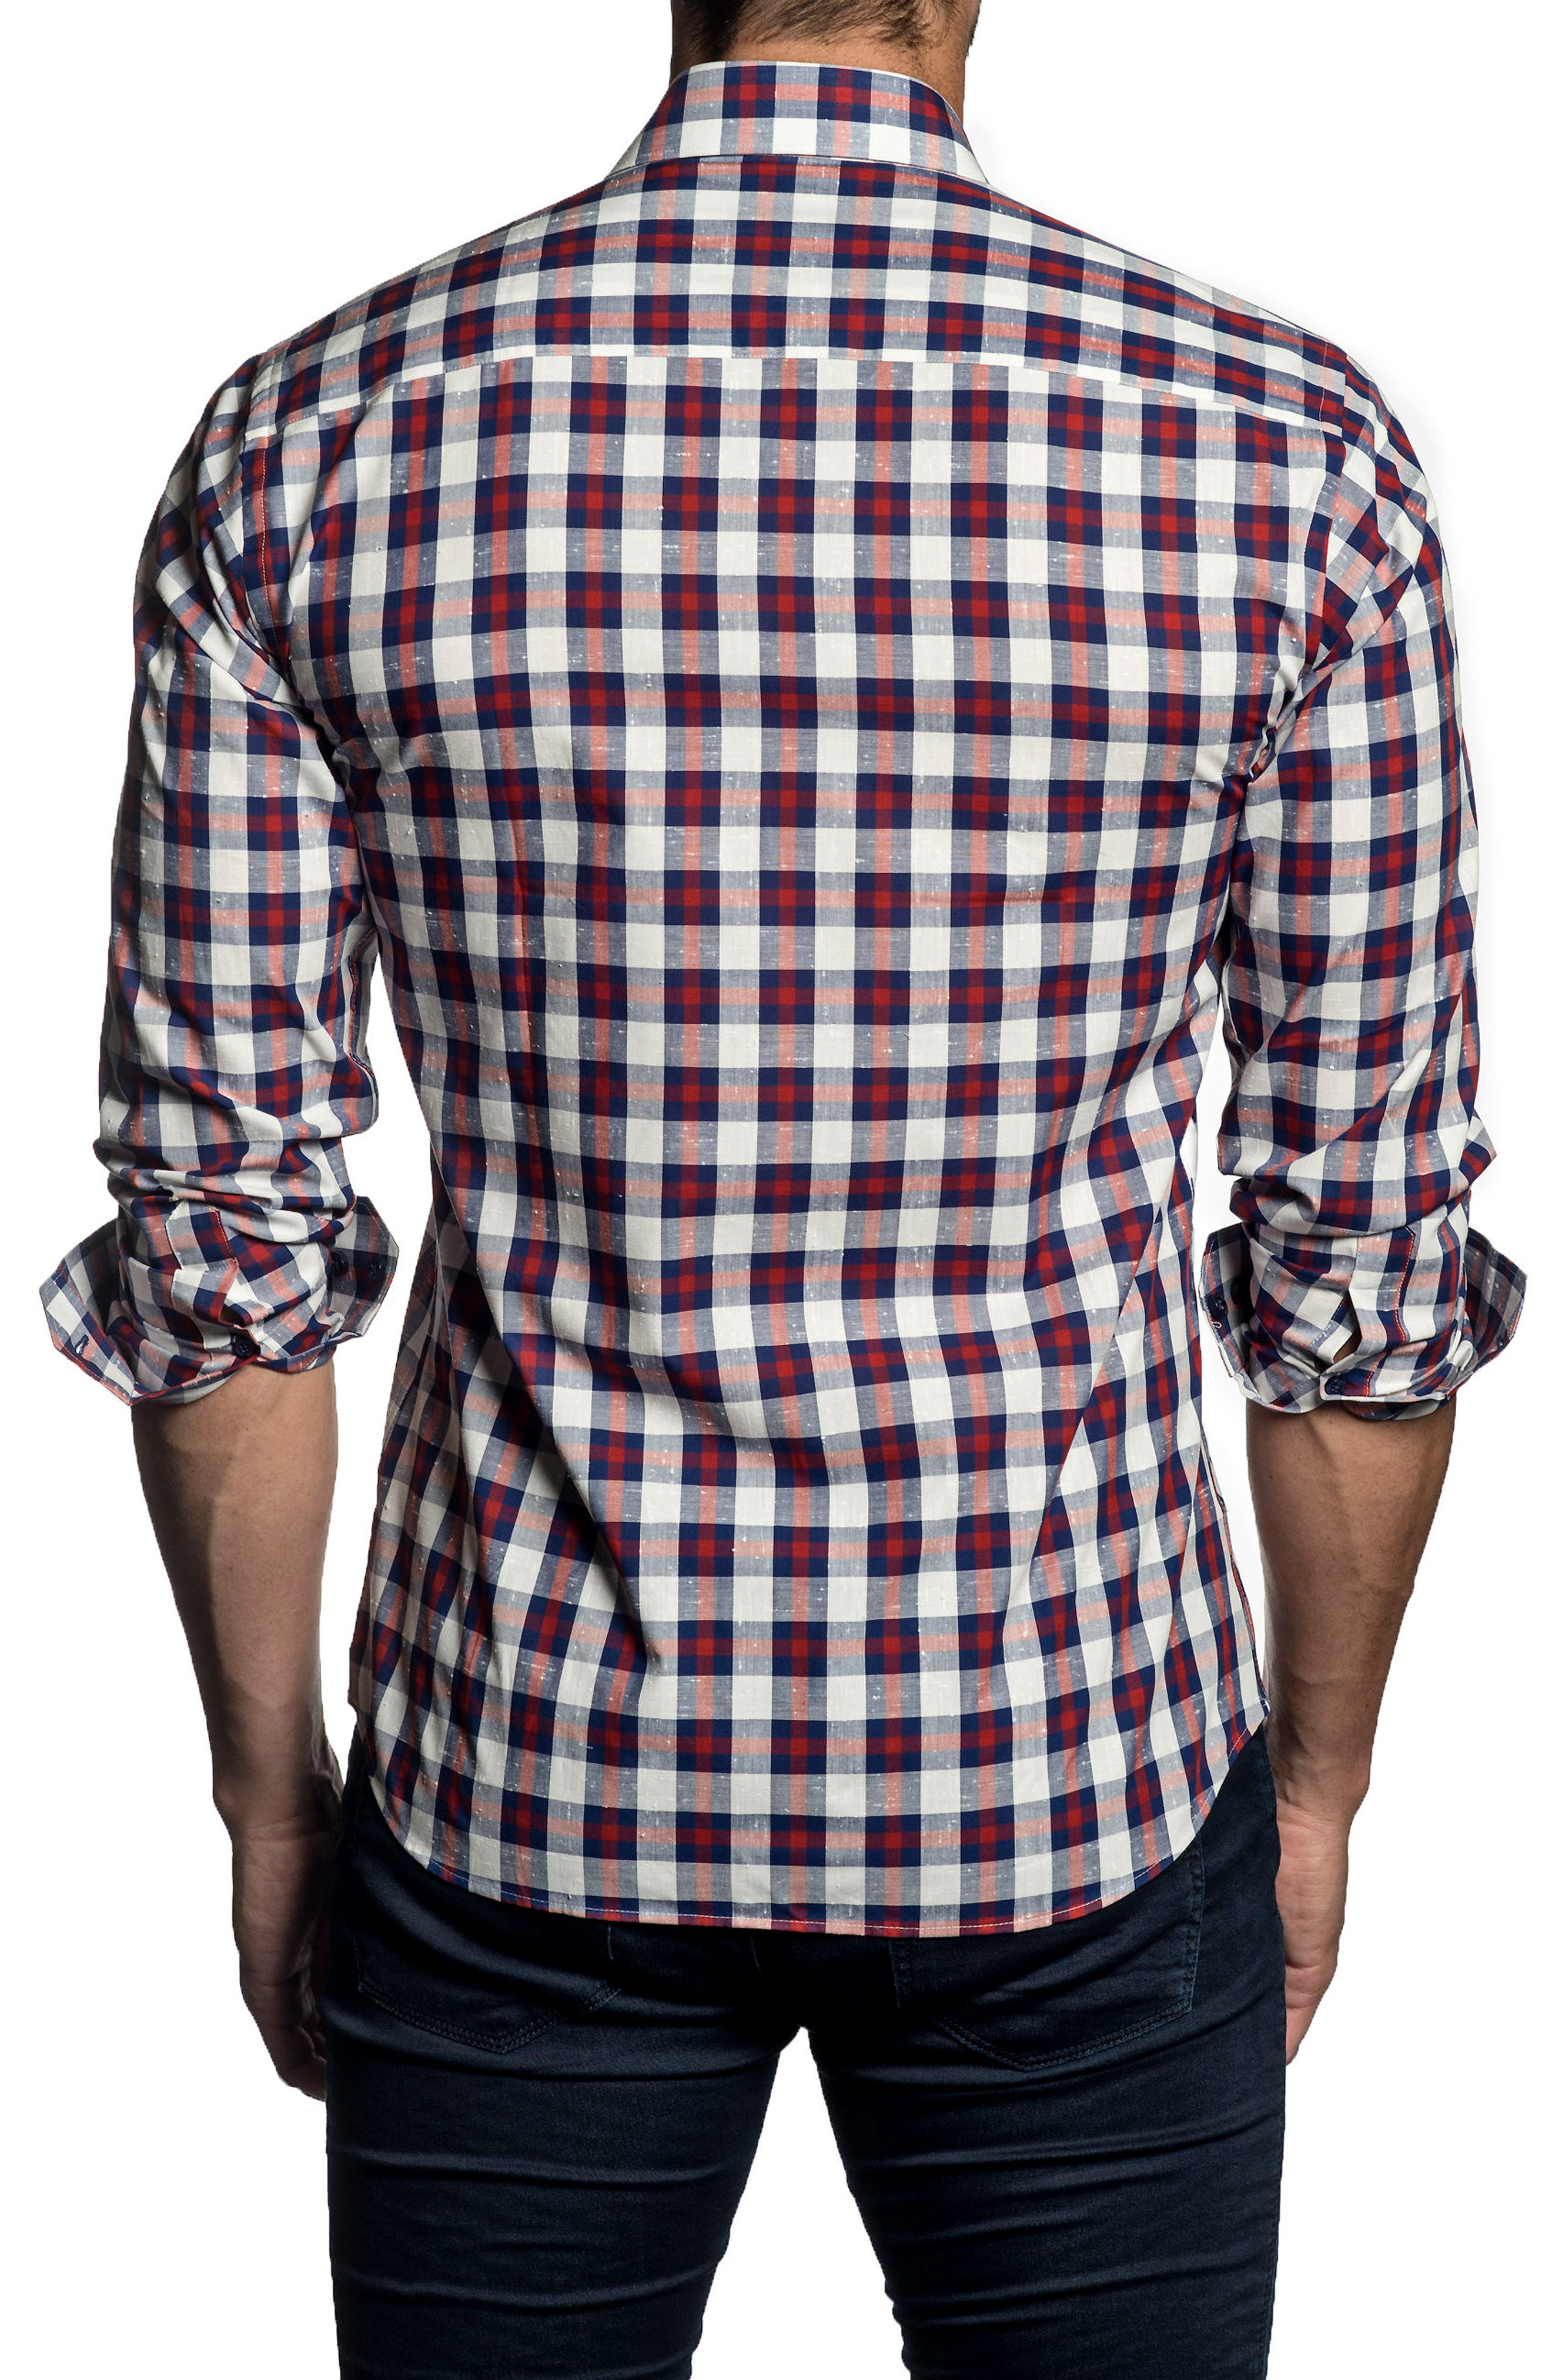 Trim Fit Plaid Sport Shirt,                             Alternate thumbnail 2, color,                             White - Blue - Red Check